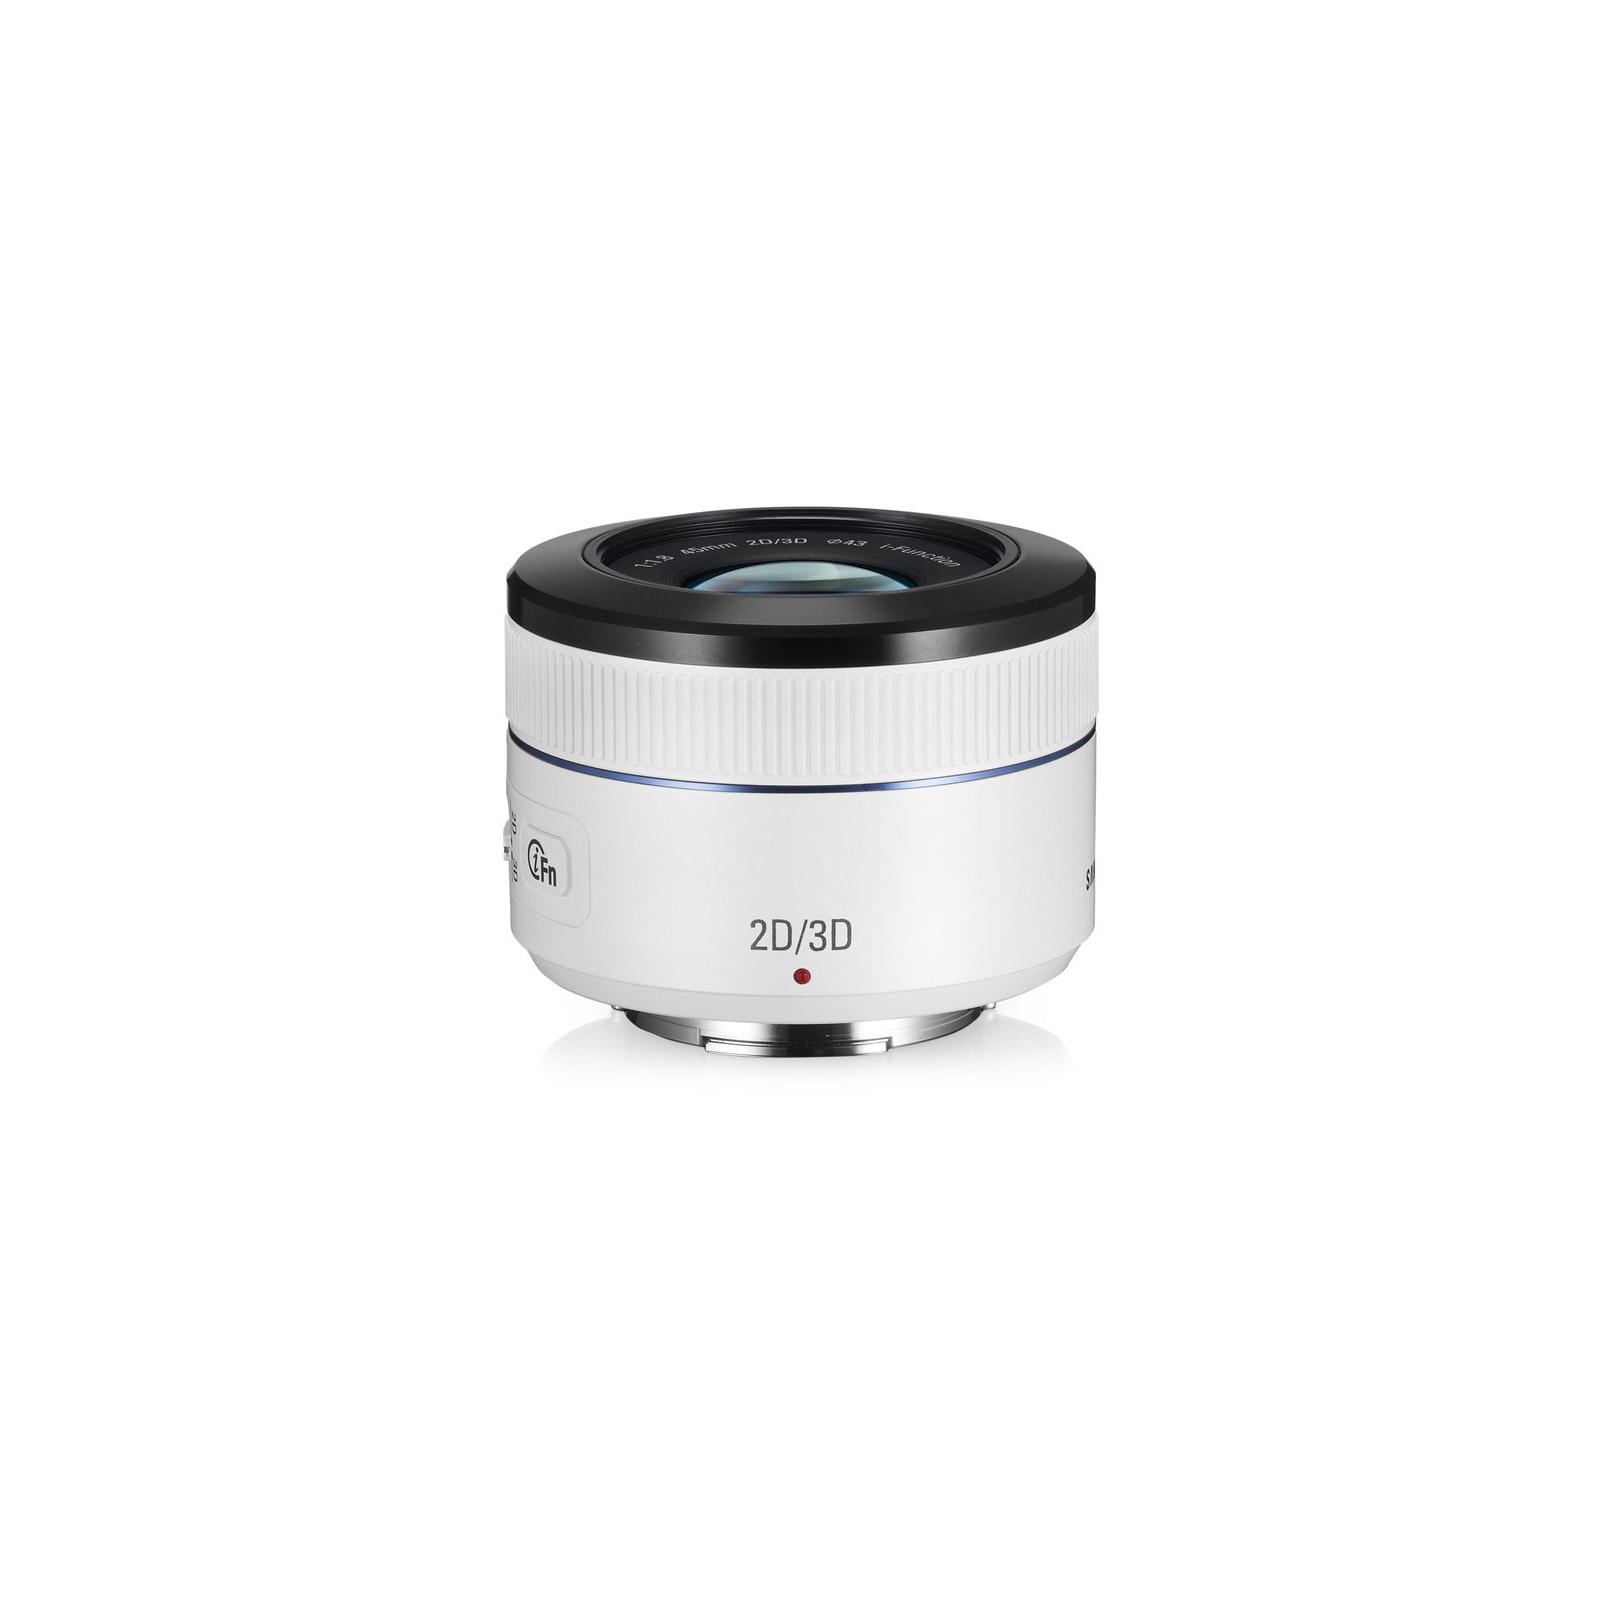 Объектив Samsung EX-S45ADW 45 mm f/1.8 [T6] 2D/3D (EX-S45ADW) изображение 2